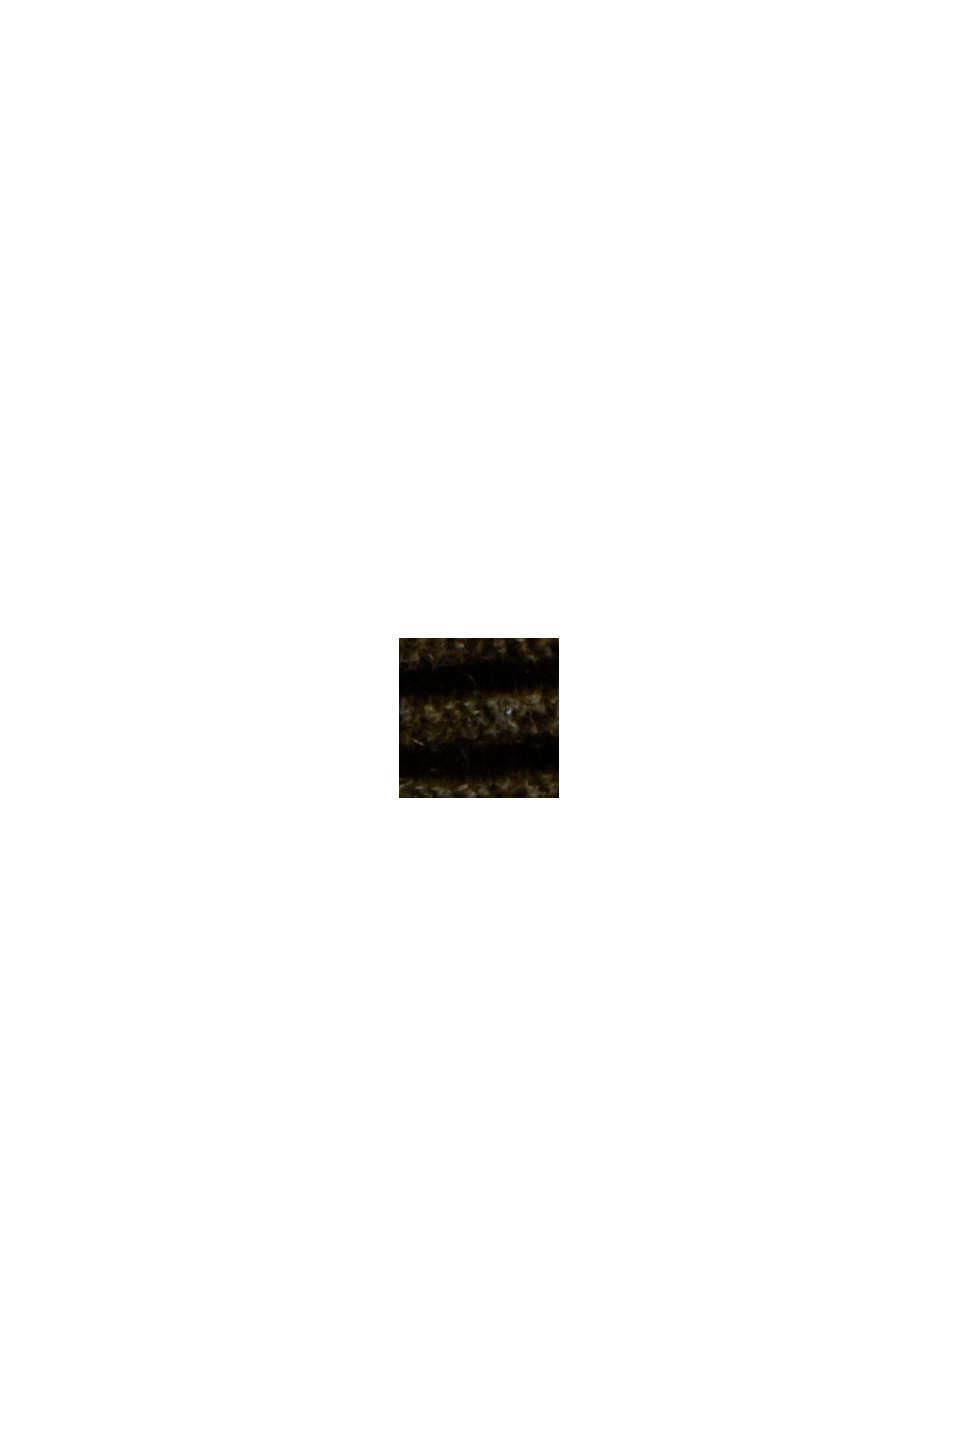 Geribde trui met kraag met tunnelkoord, katoen, DARK KHAKI, swatch